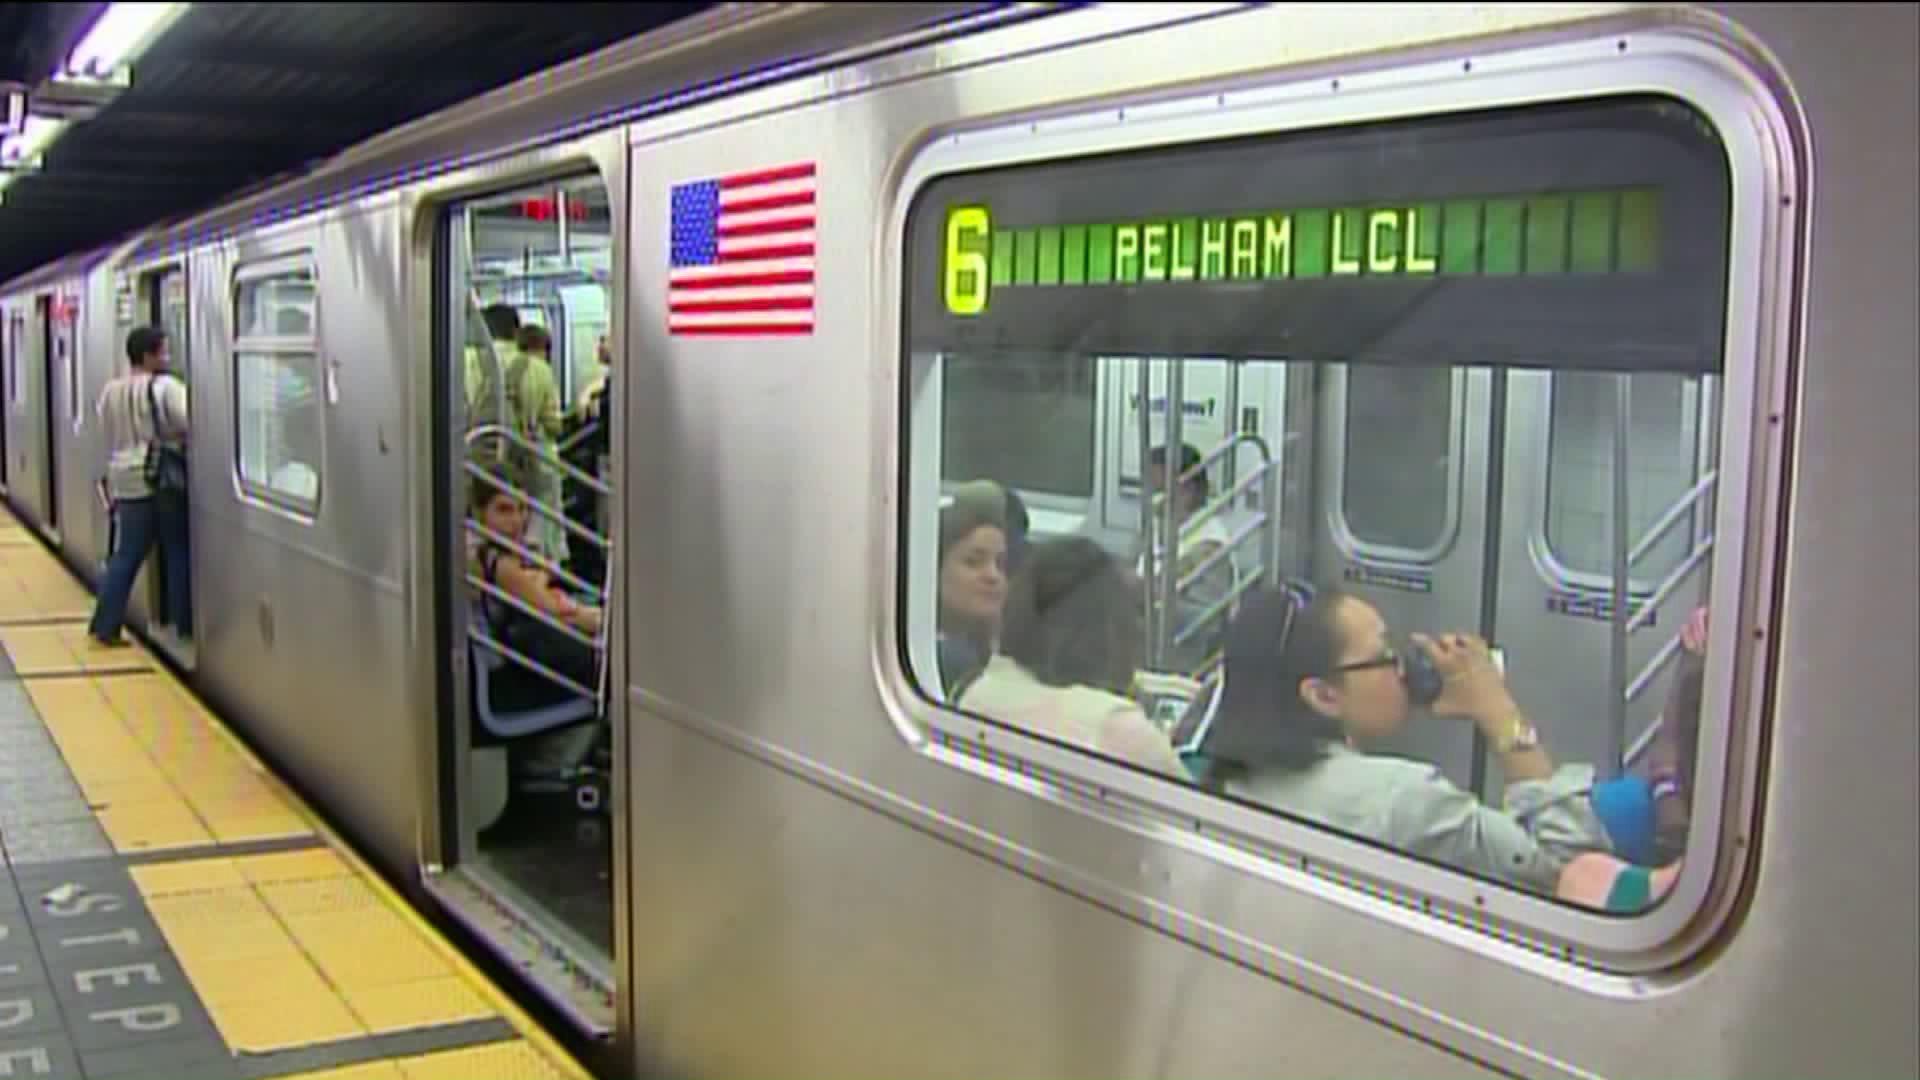 No. 6 subway train line